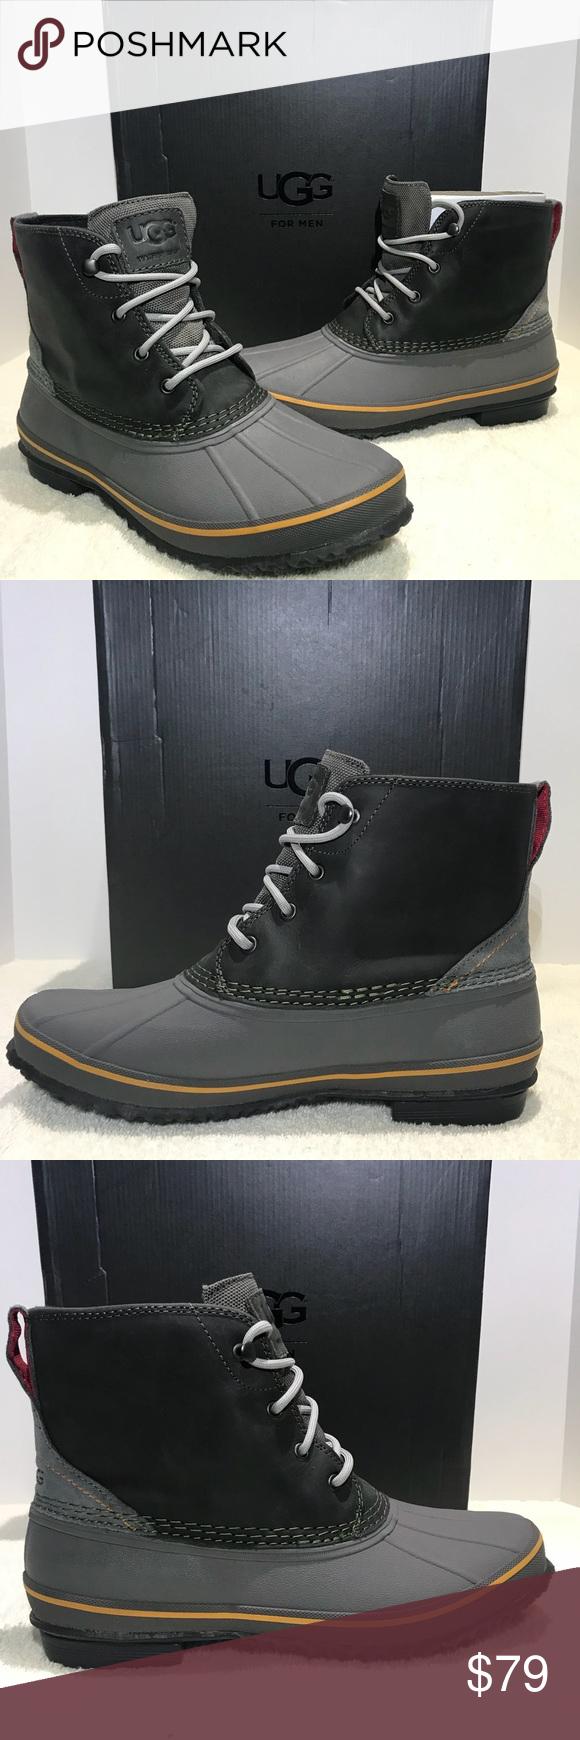 4888a6785a7 UGG Mens Zetik Boot Waterproof Leather 1017304 UGG Zetik Hiking Boot ...